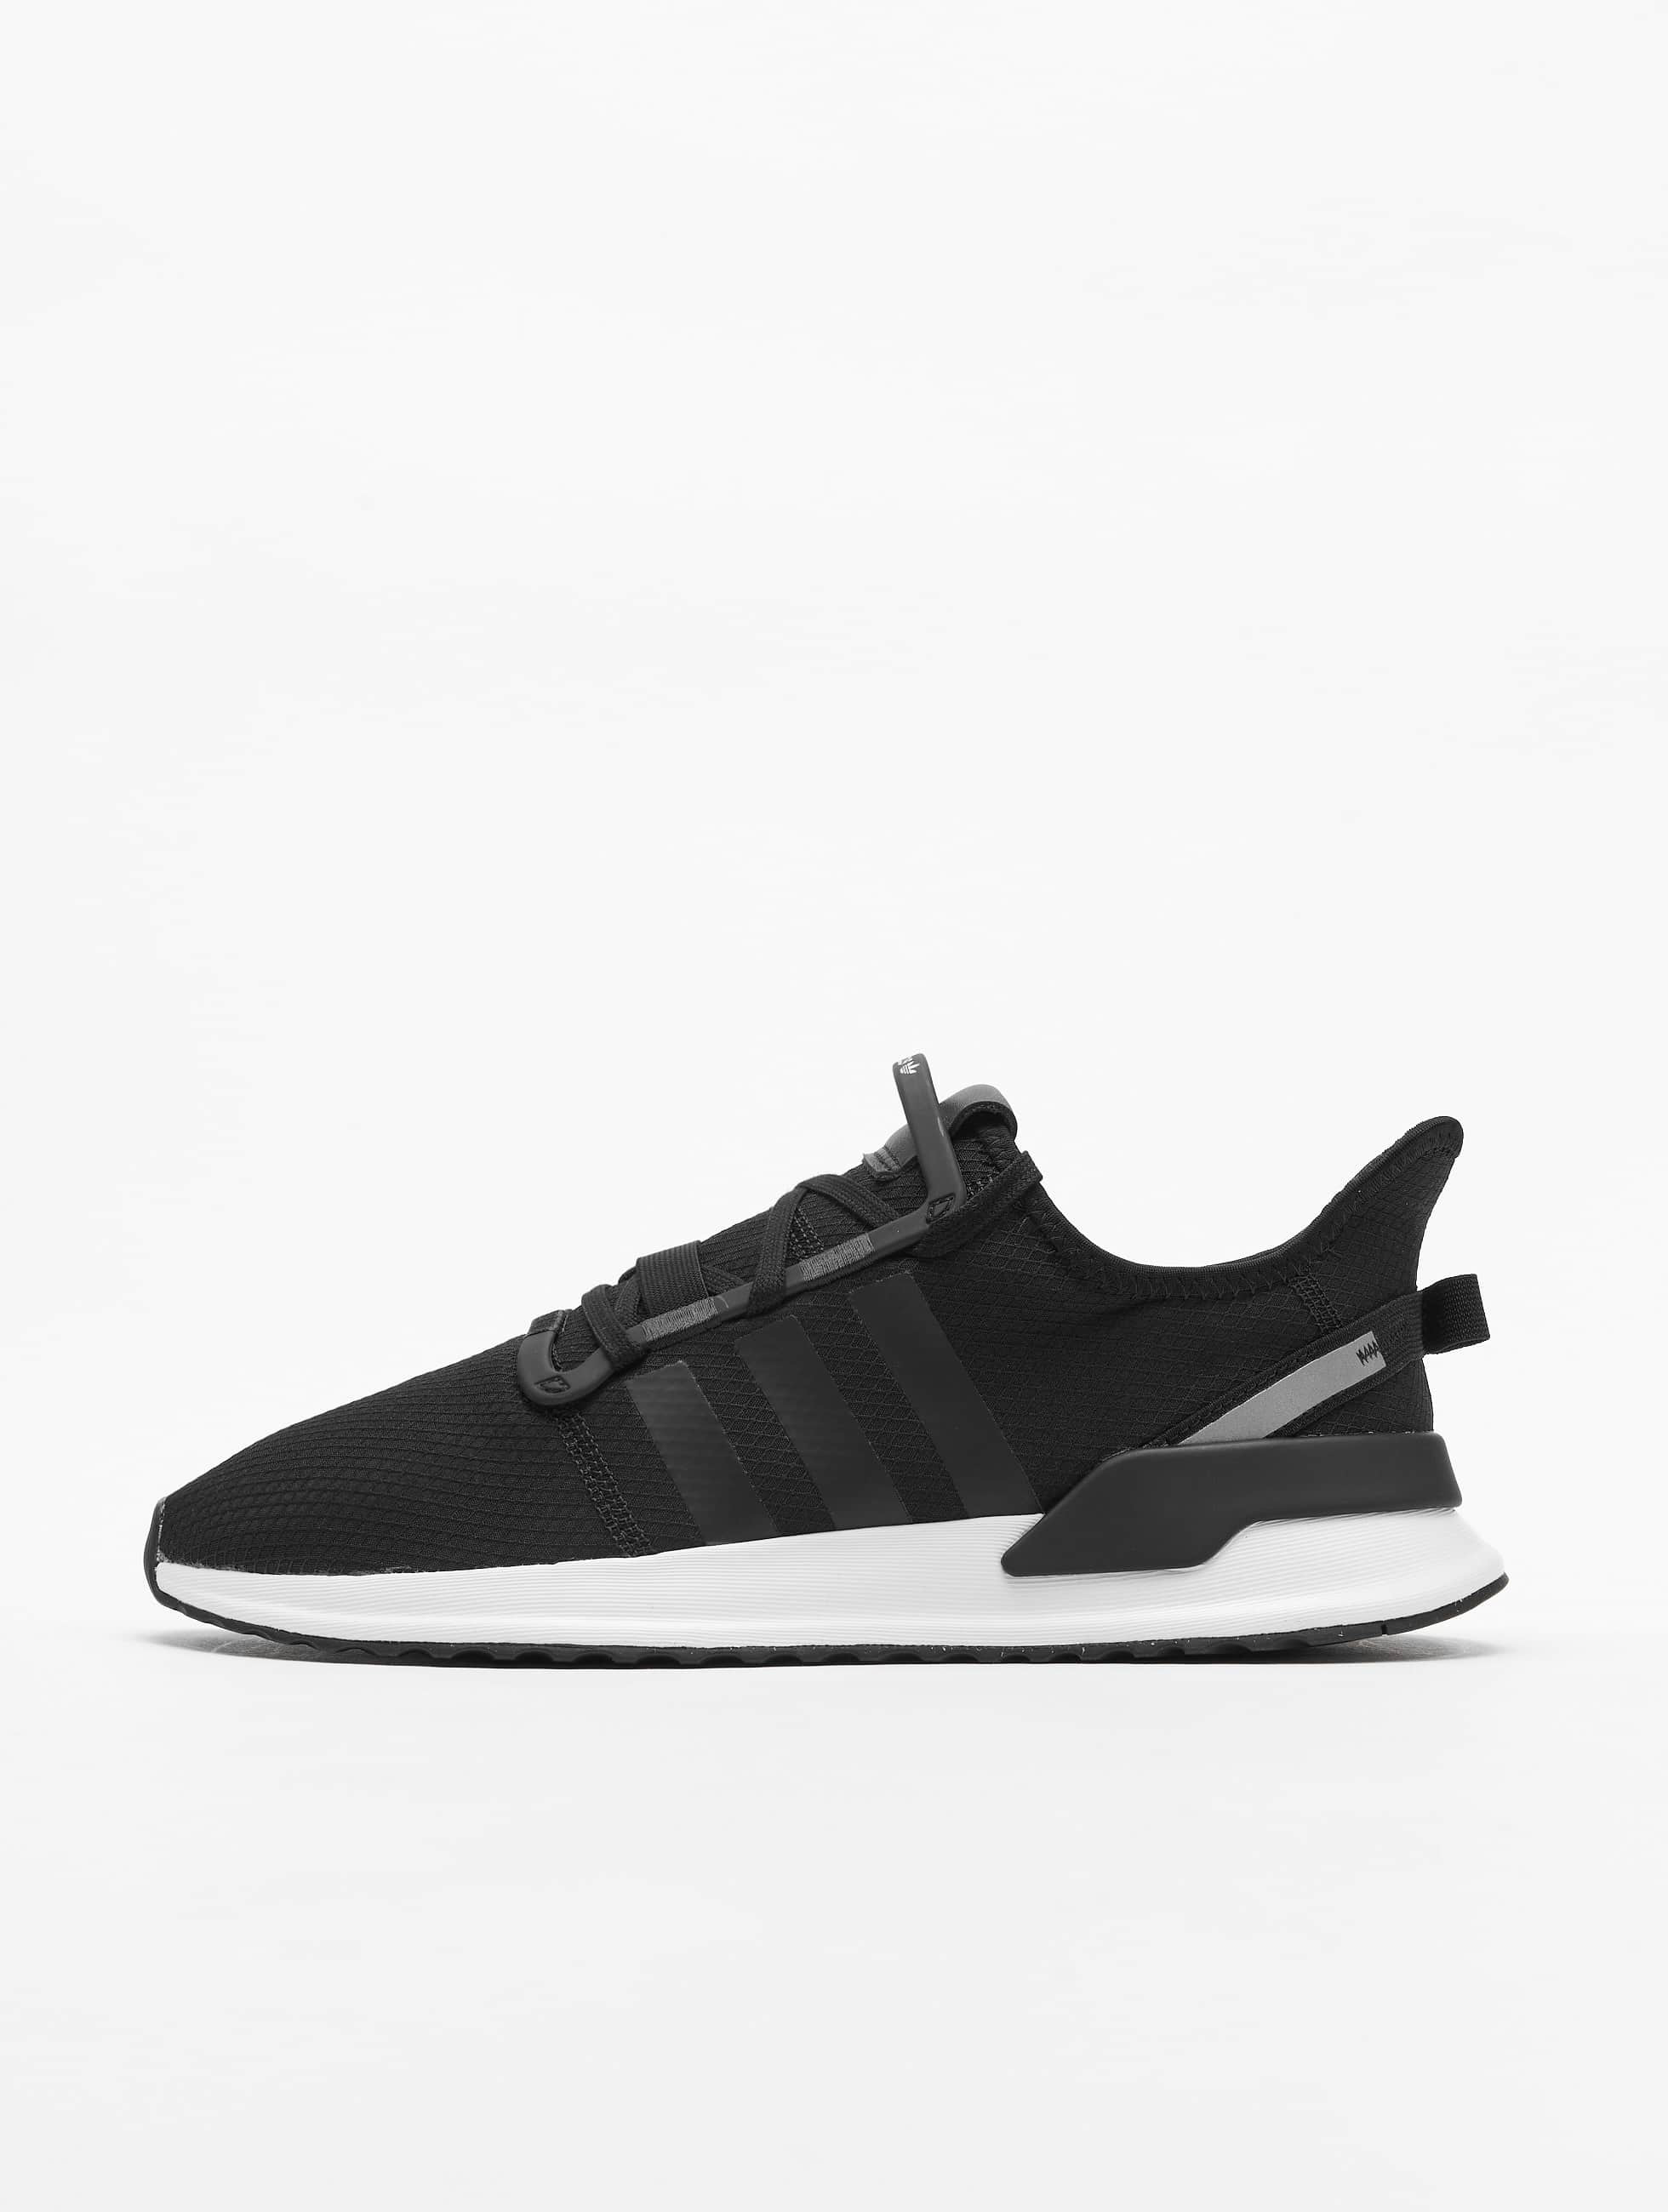 Adidas Originals U_Path Run Sneakers Core BlackCore BlackFtw White